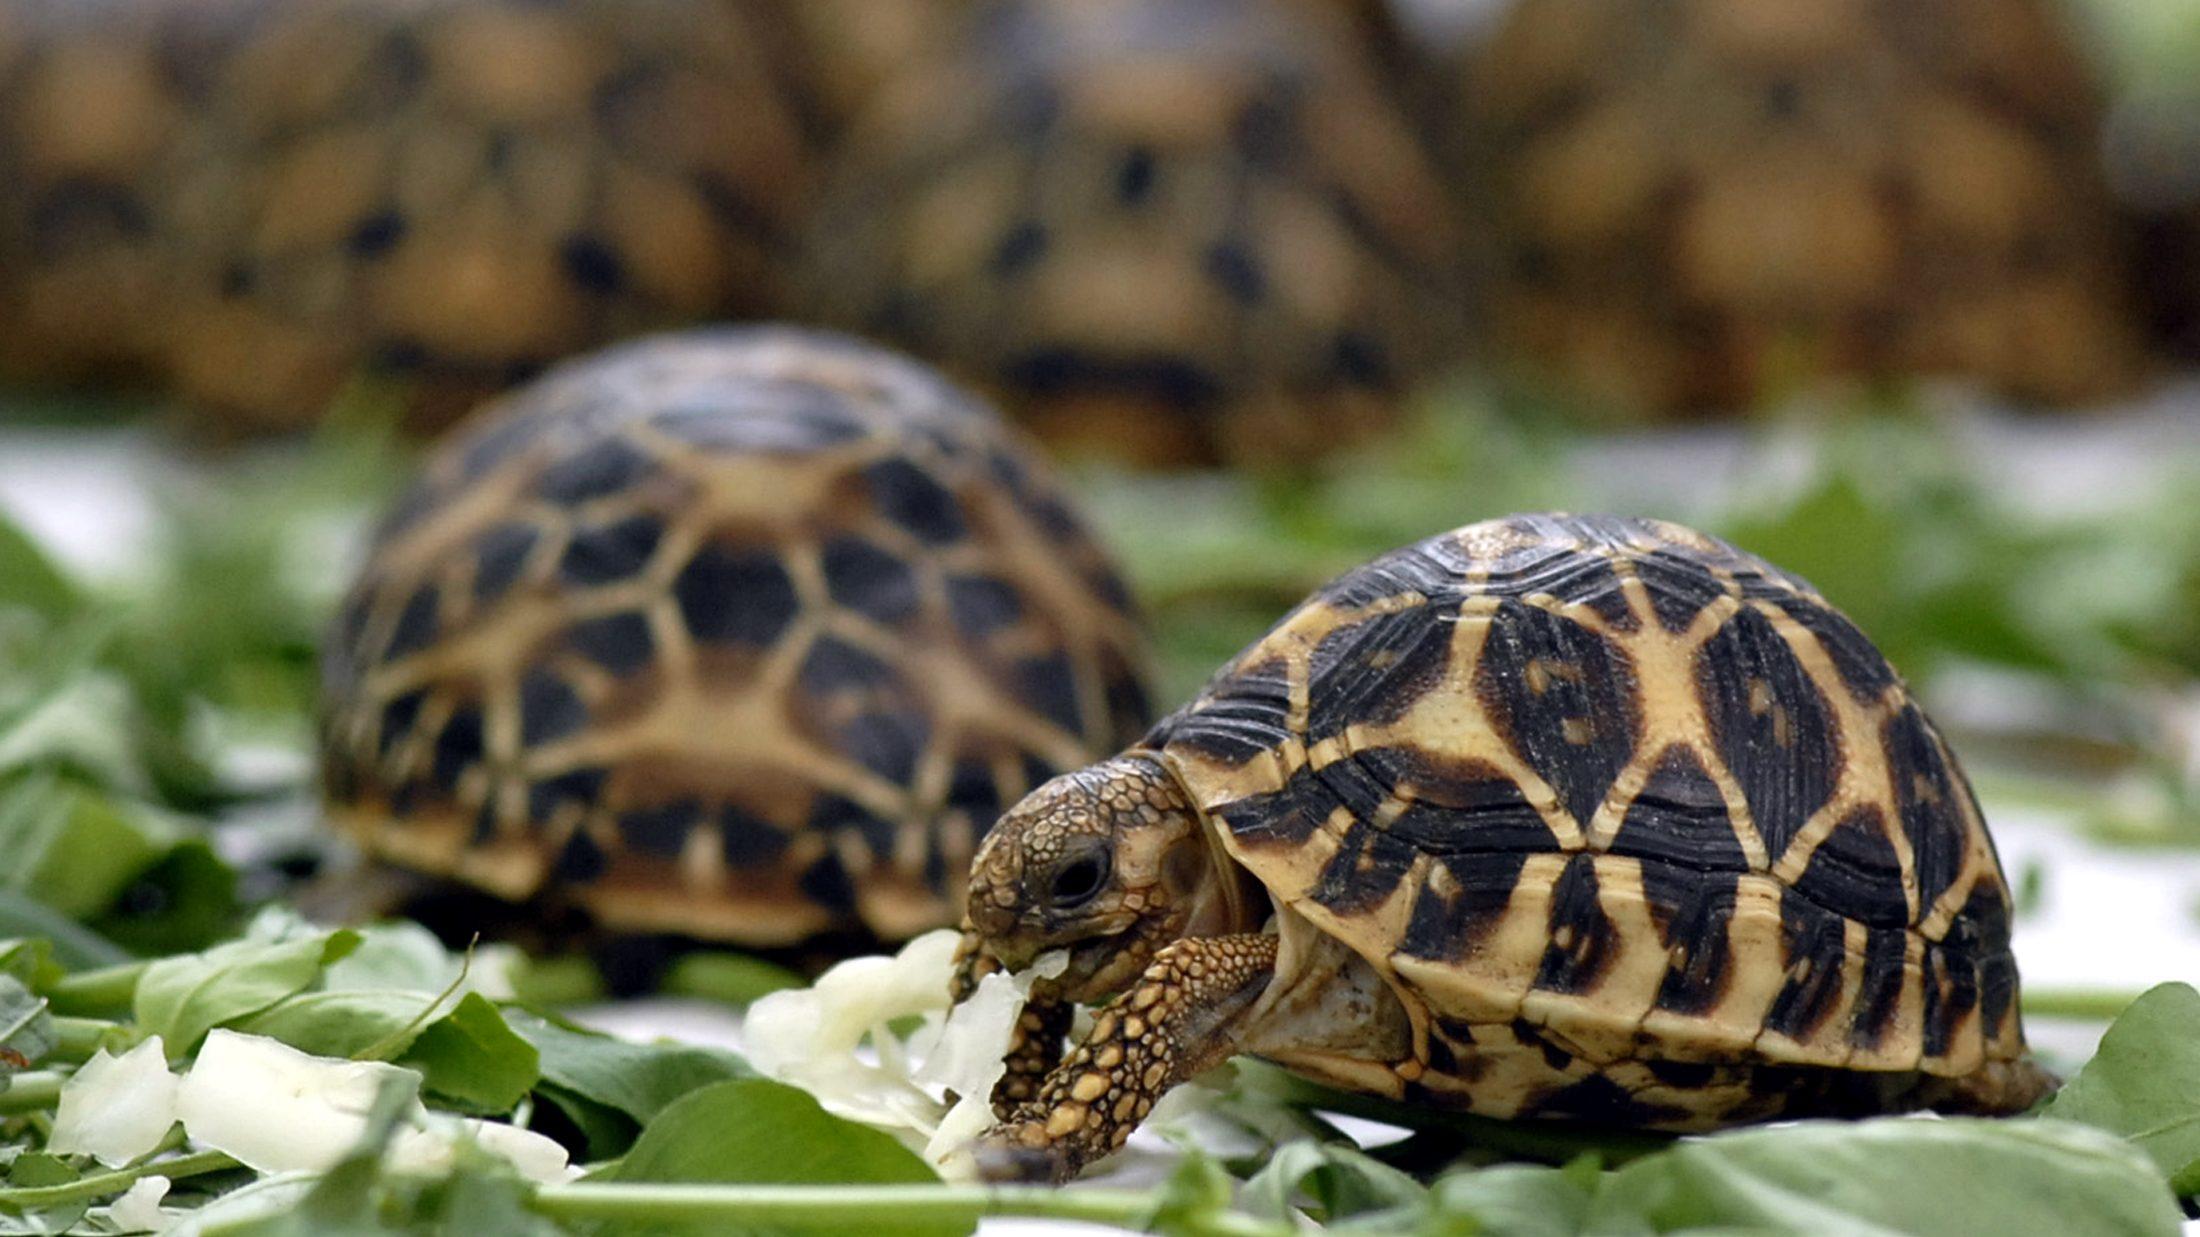 Demand for pets, medicines worsen India's illegal wildlife trade